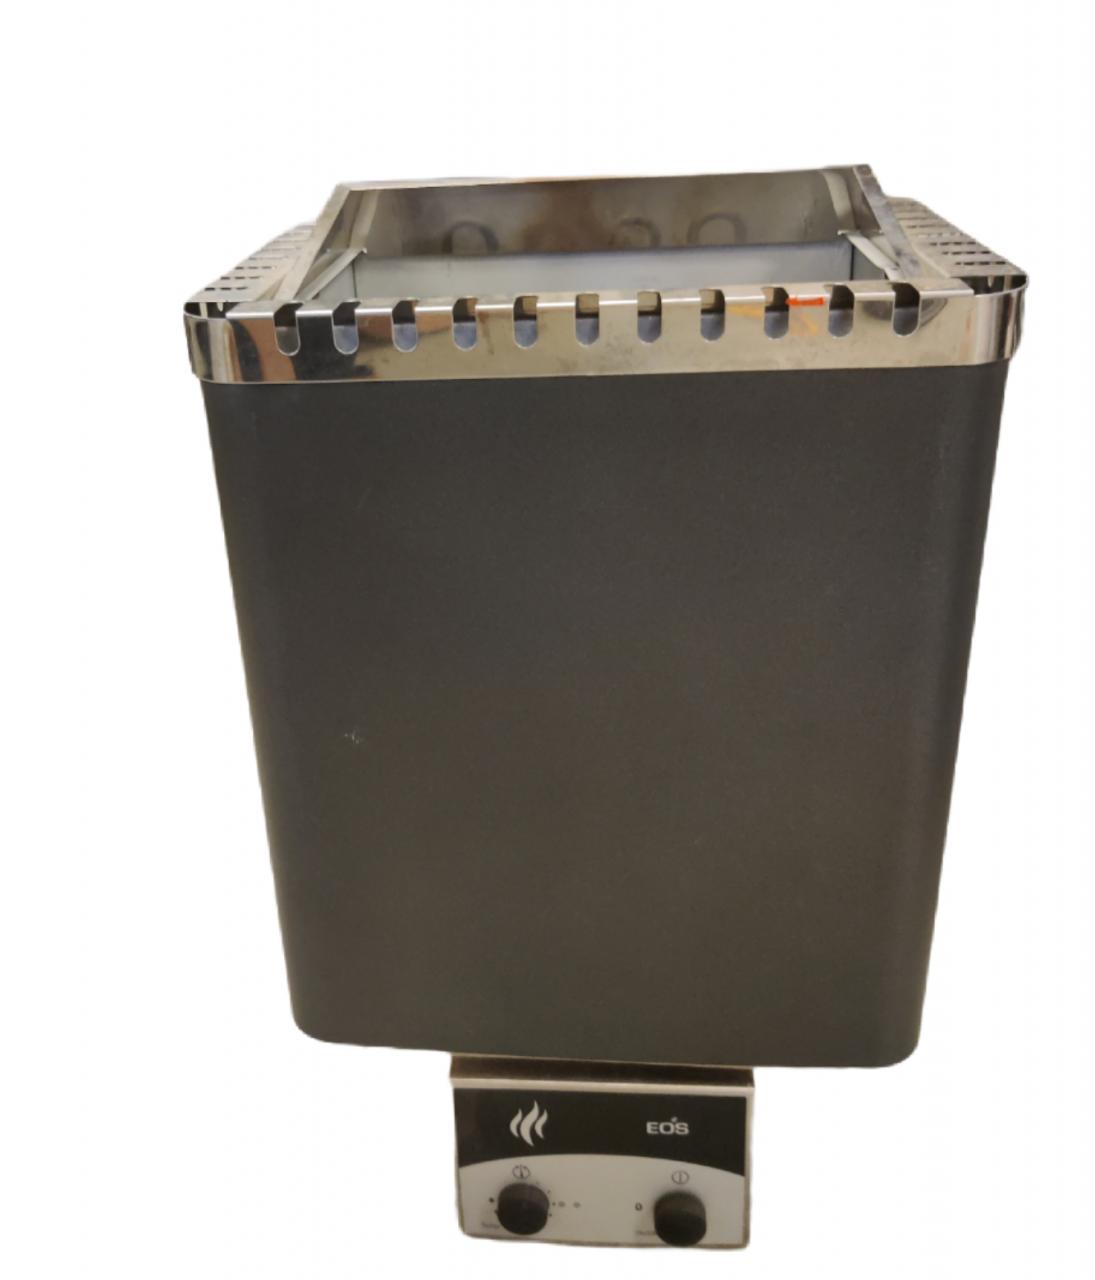 EOs saunaoven 8.0 kW incl. besturing (Refurbished)